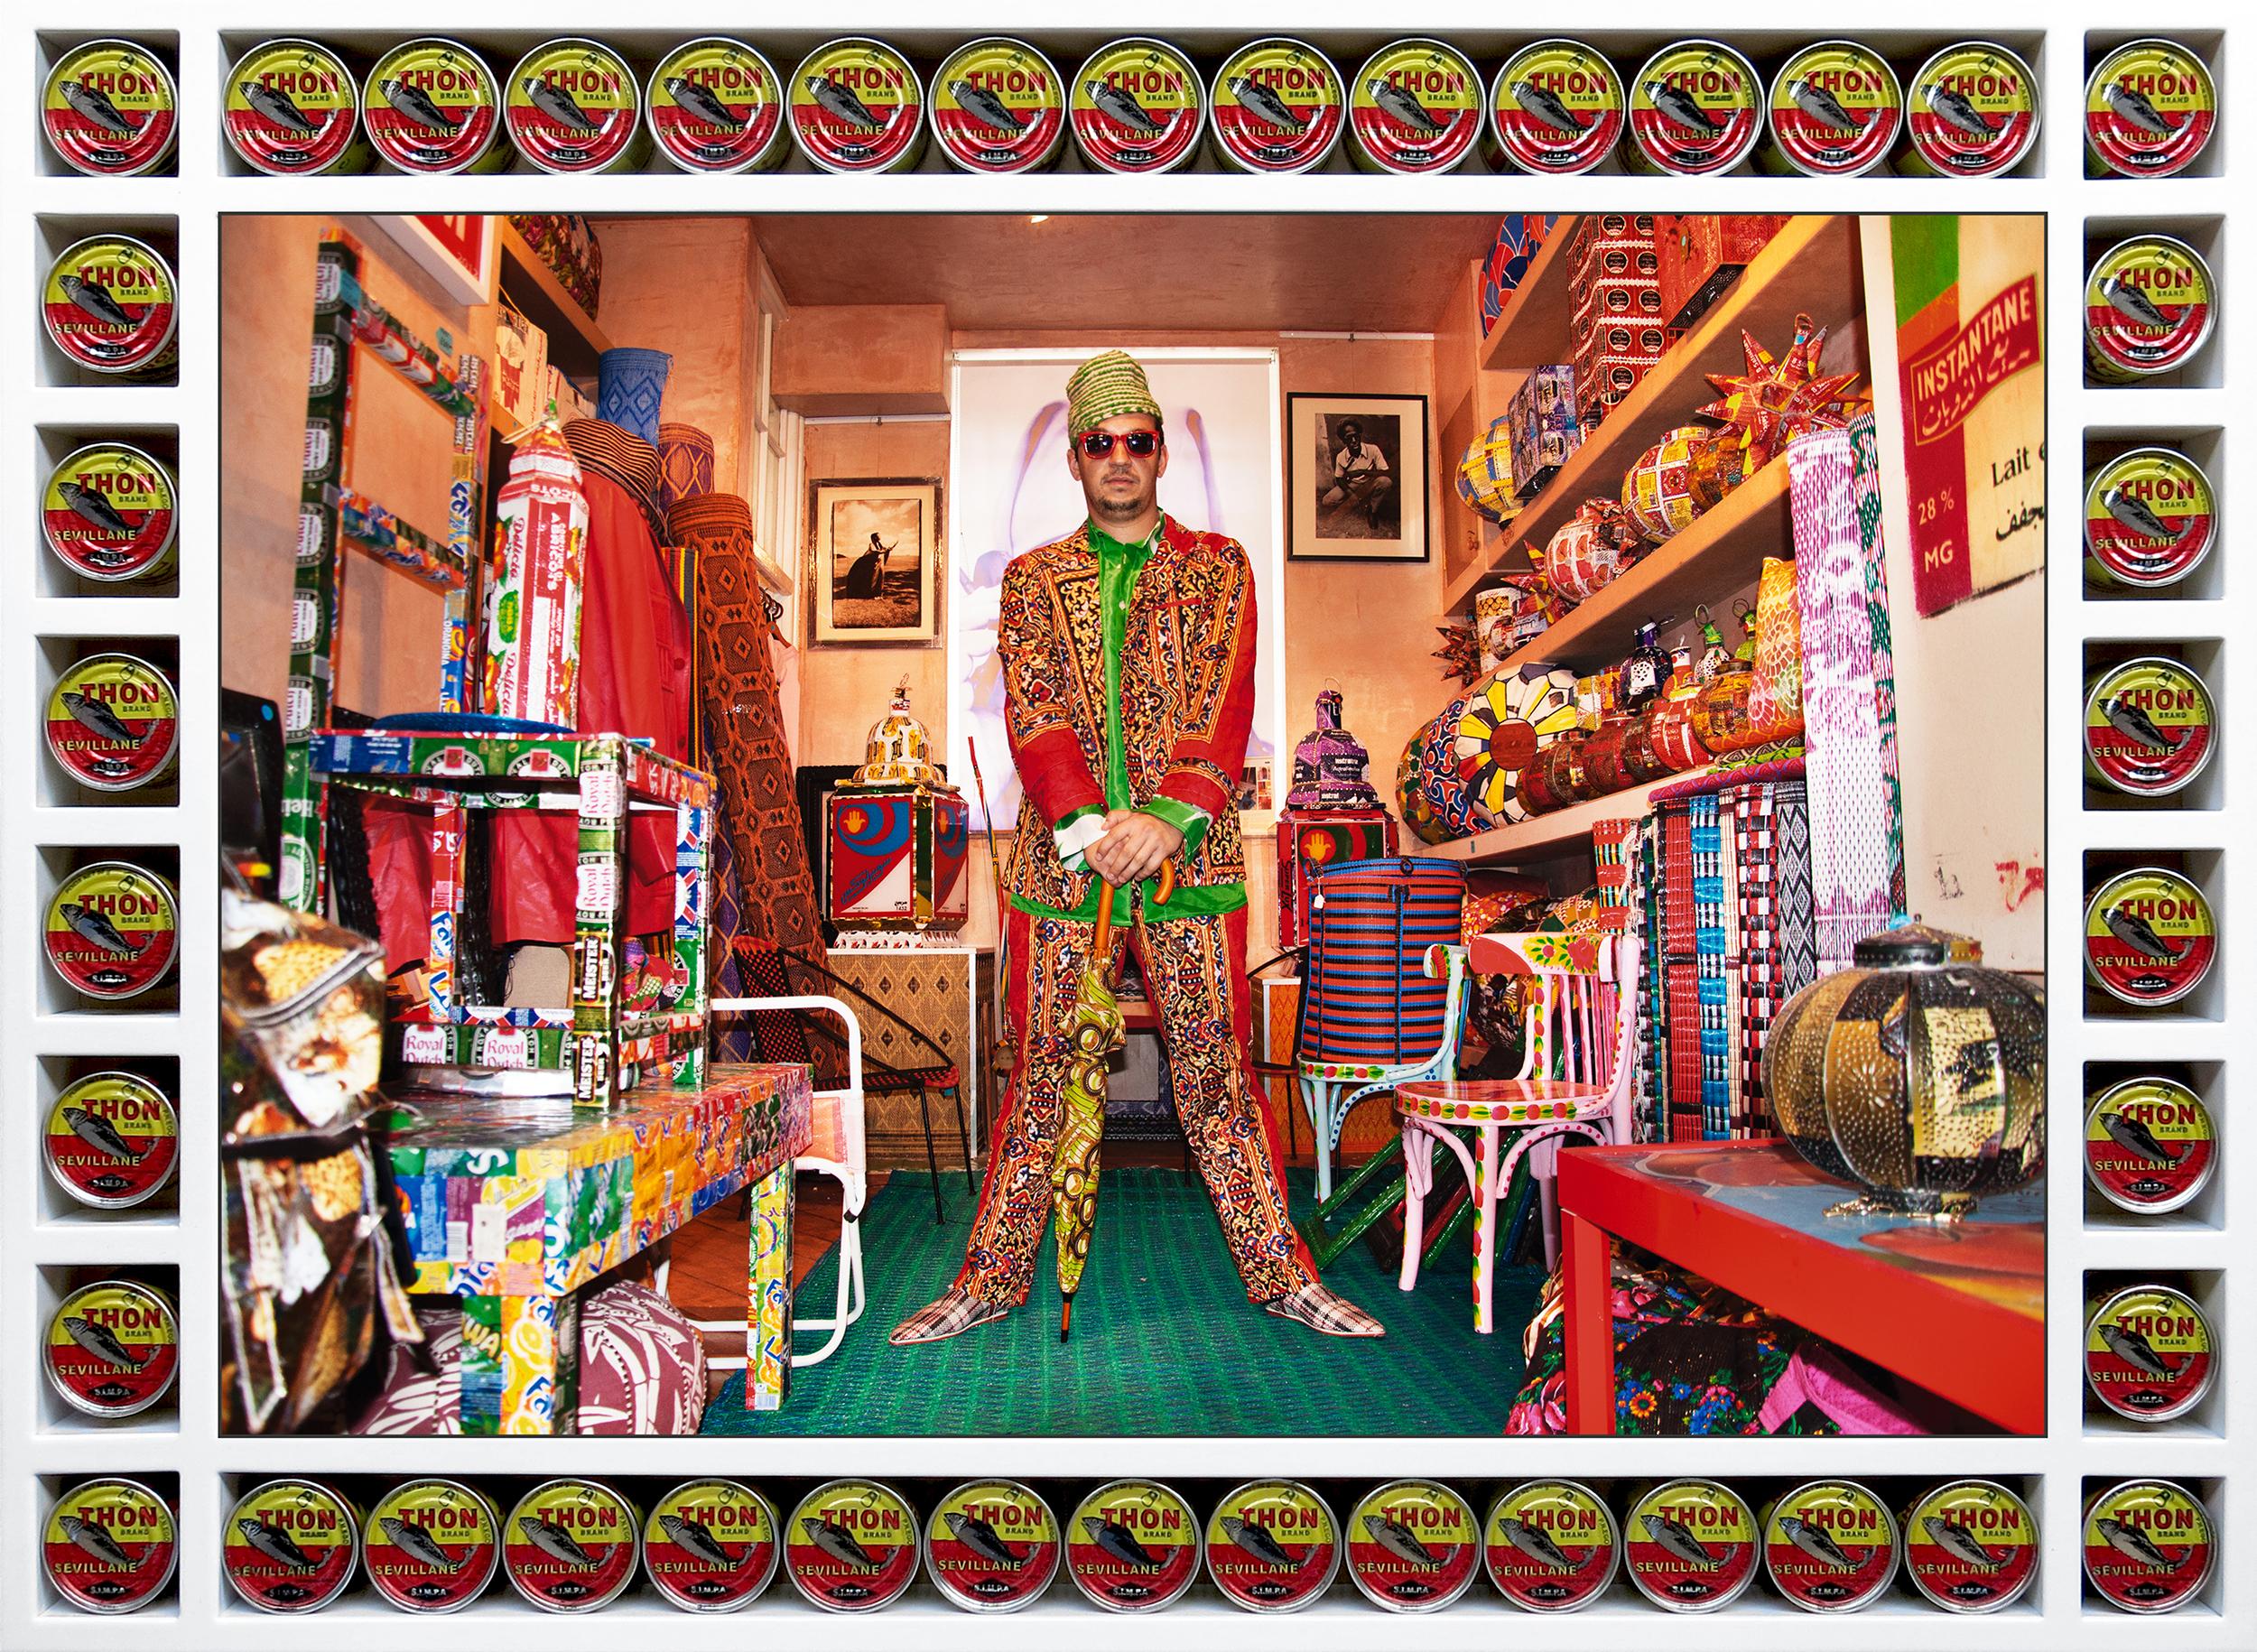 Hassan Hajjaj, Younes in Da Shop, 2012/1433. Courtesy of the Artist and L'Atelier 21, Casablanca, Morocco. courtesy